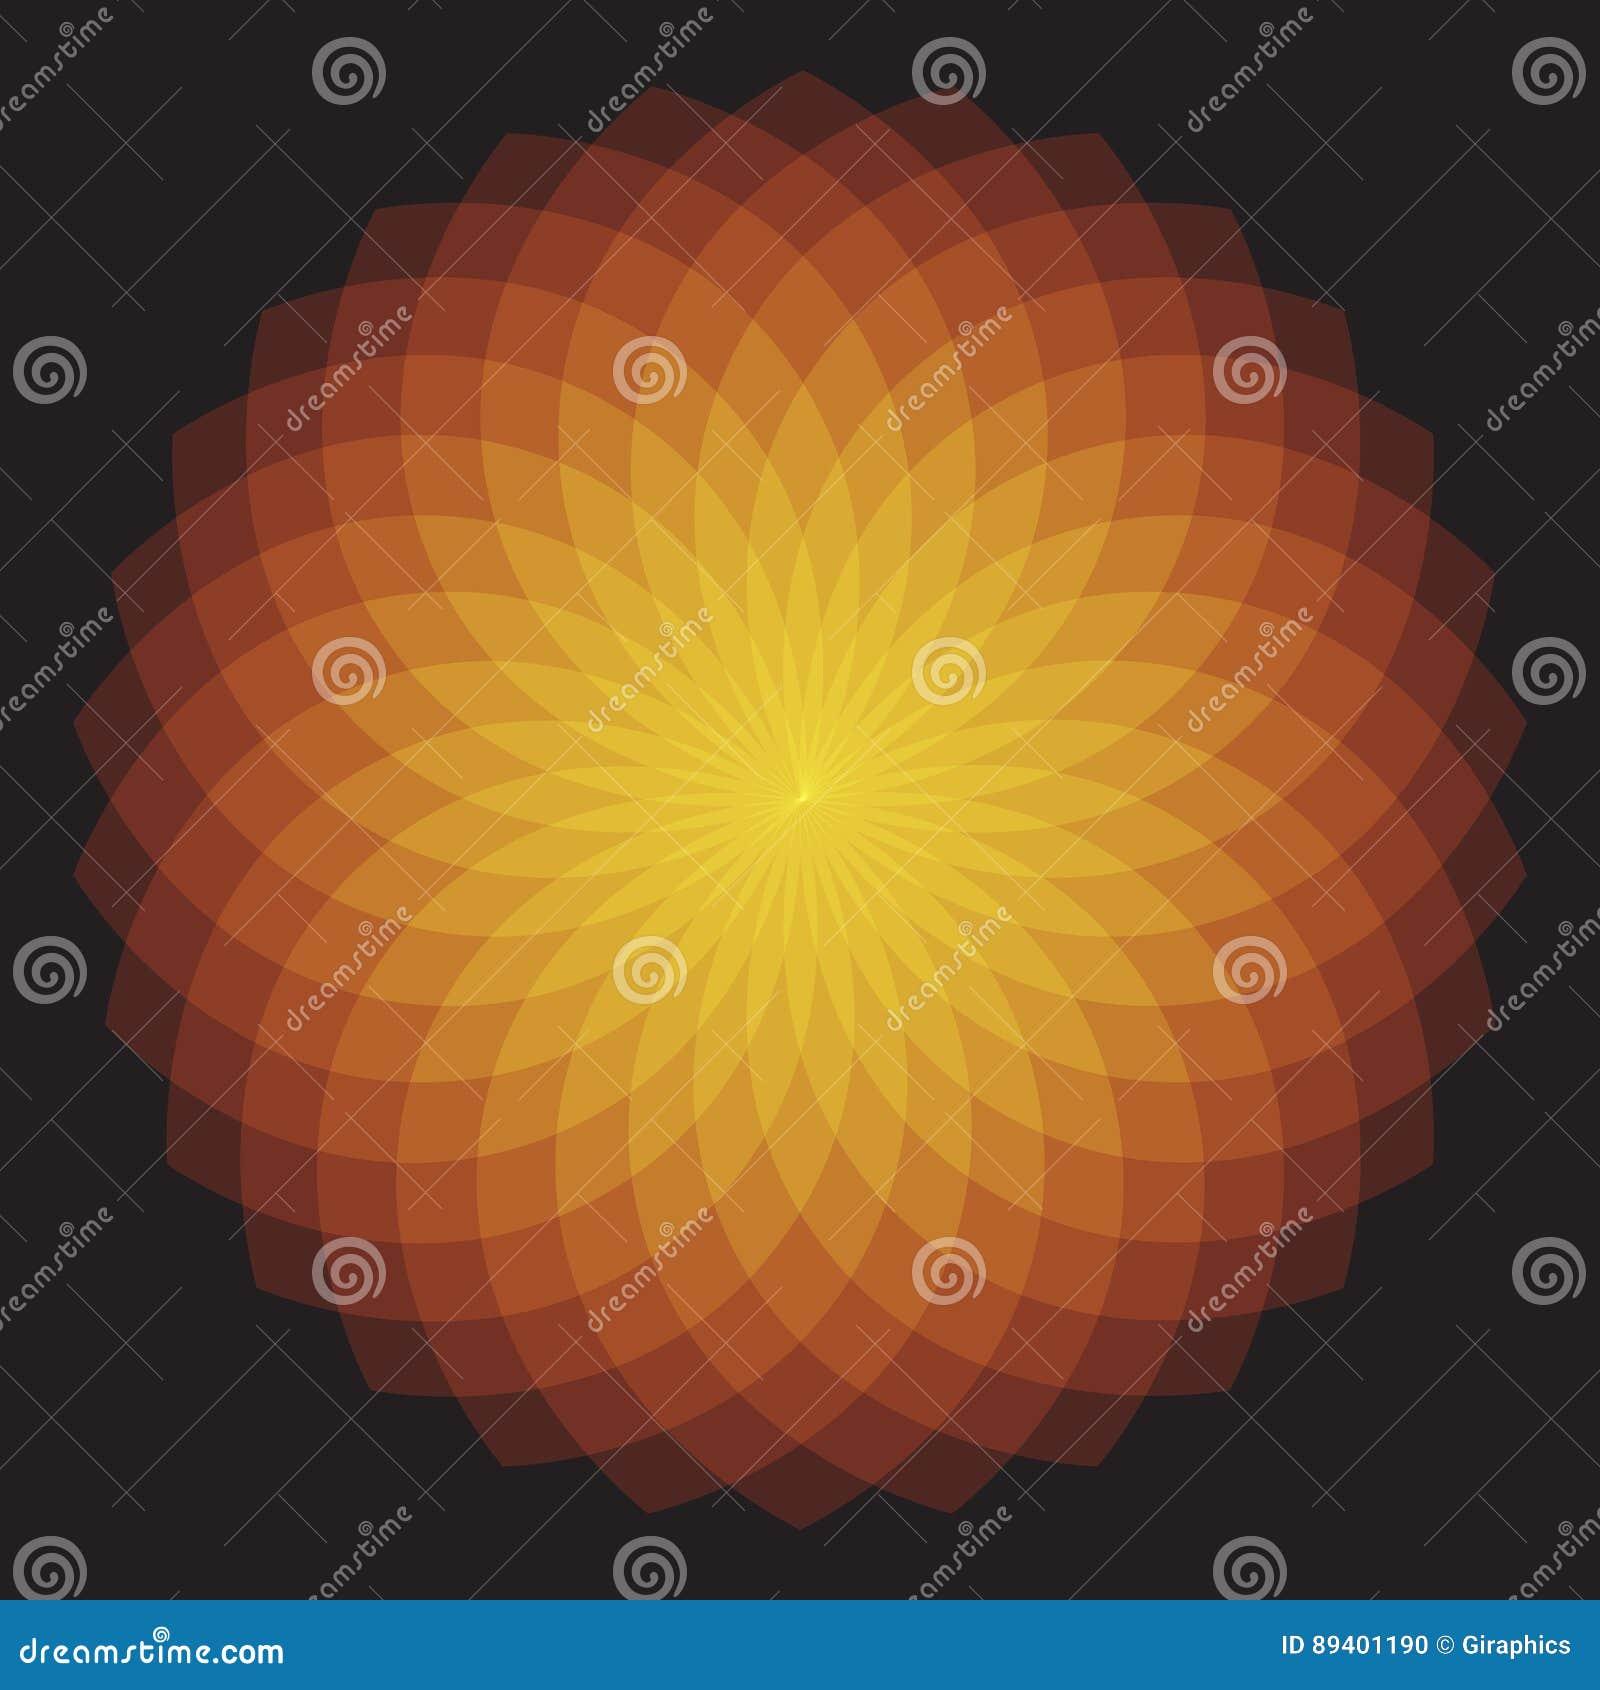 Sunburst geométrico alaranjado